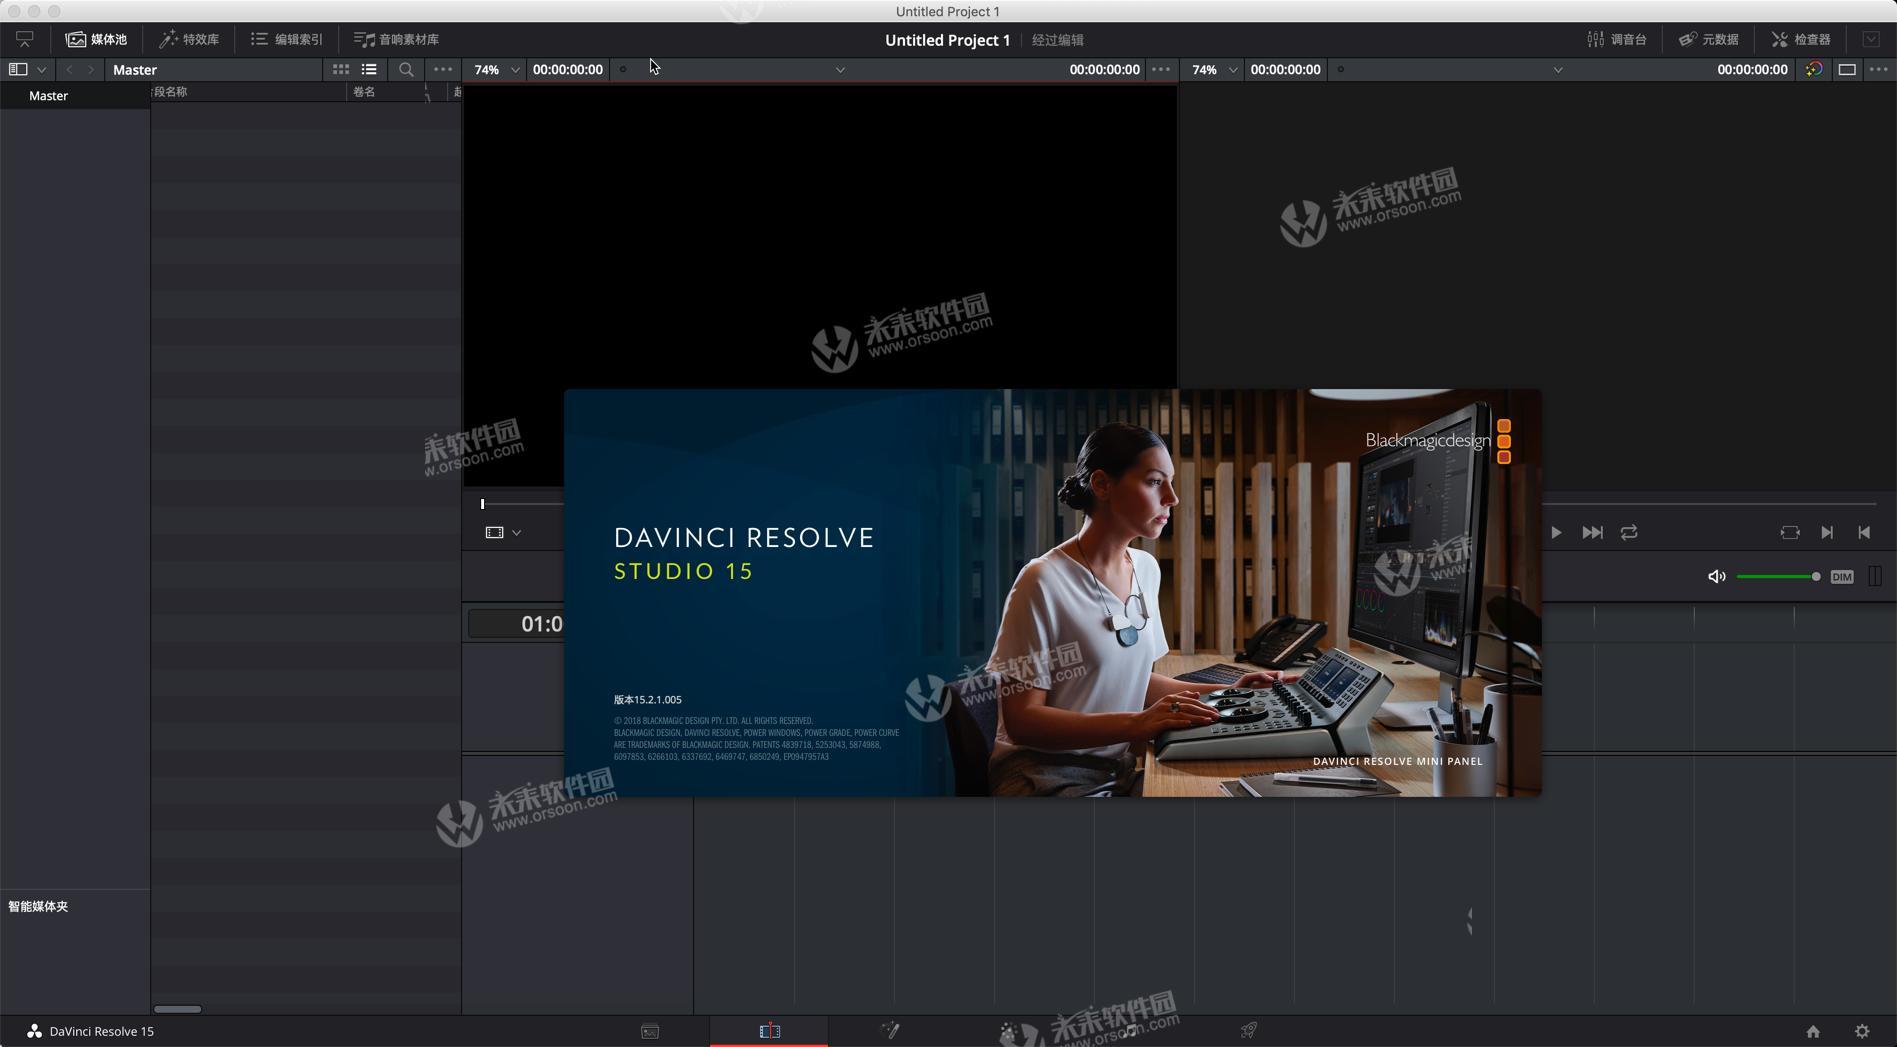 DaVinci Resolve Studio 15 Chinese crack tutorial - Programmer Sought